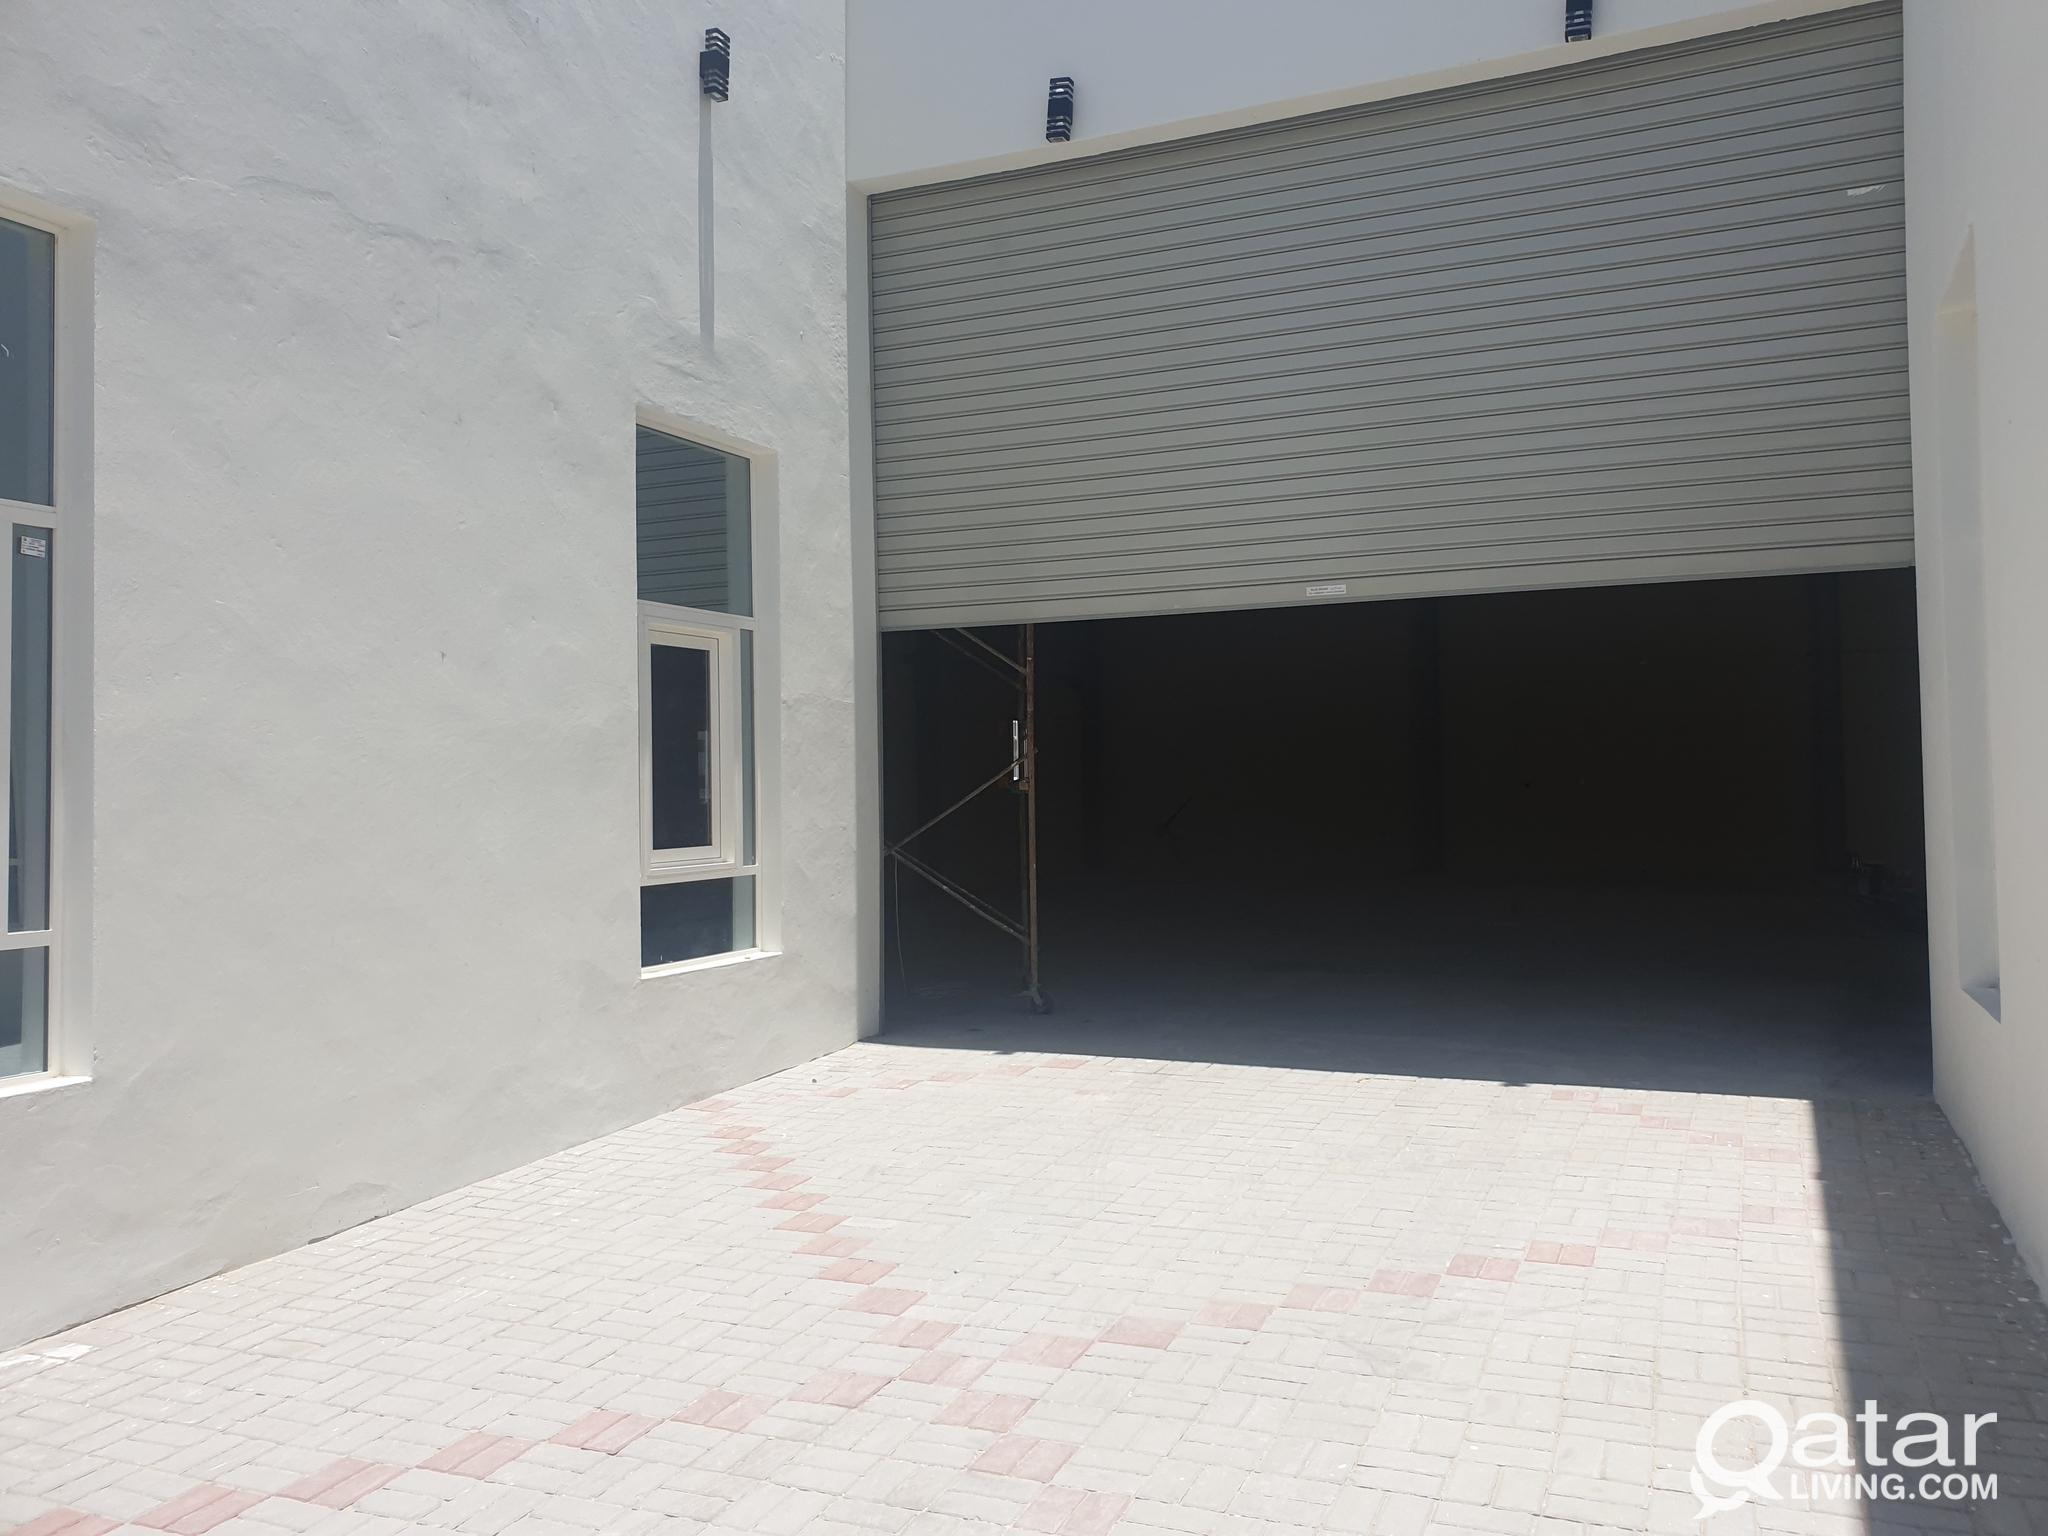 Warehouses in berkat alawameer& abo seleel 1000 sq